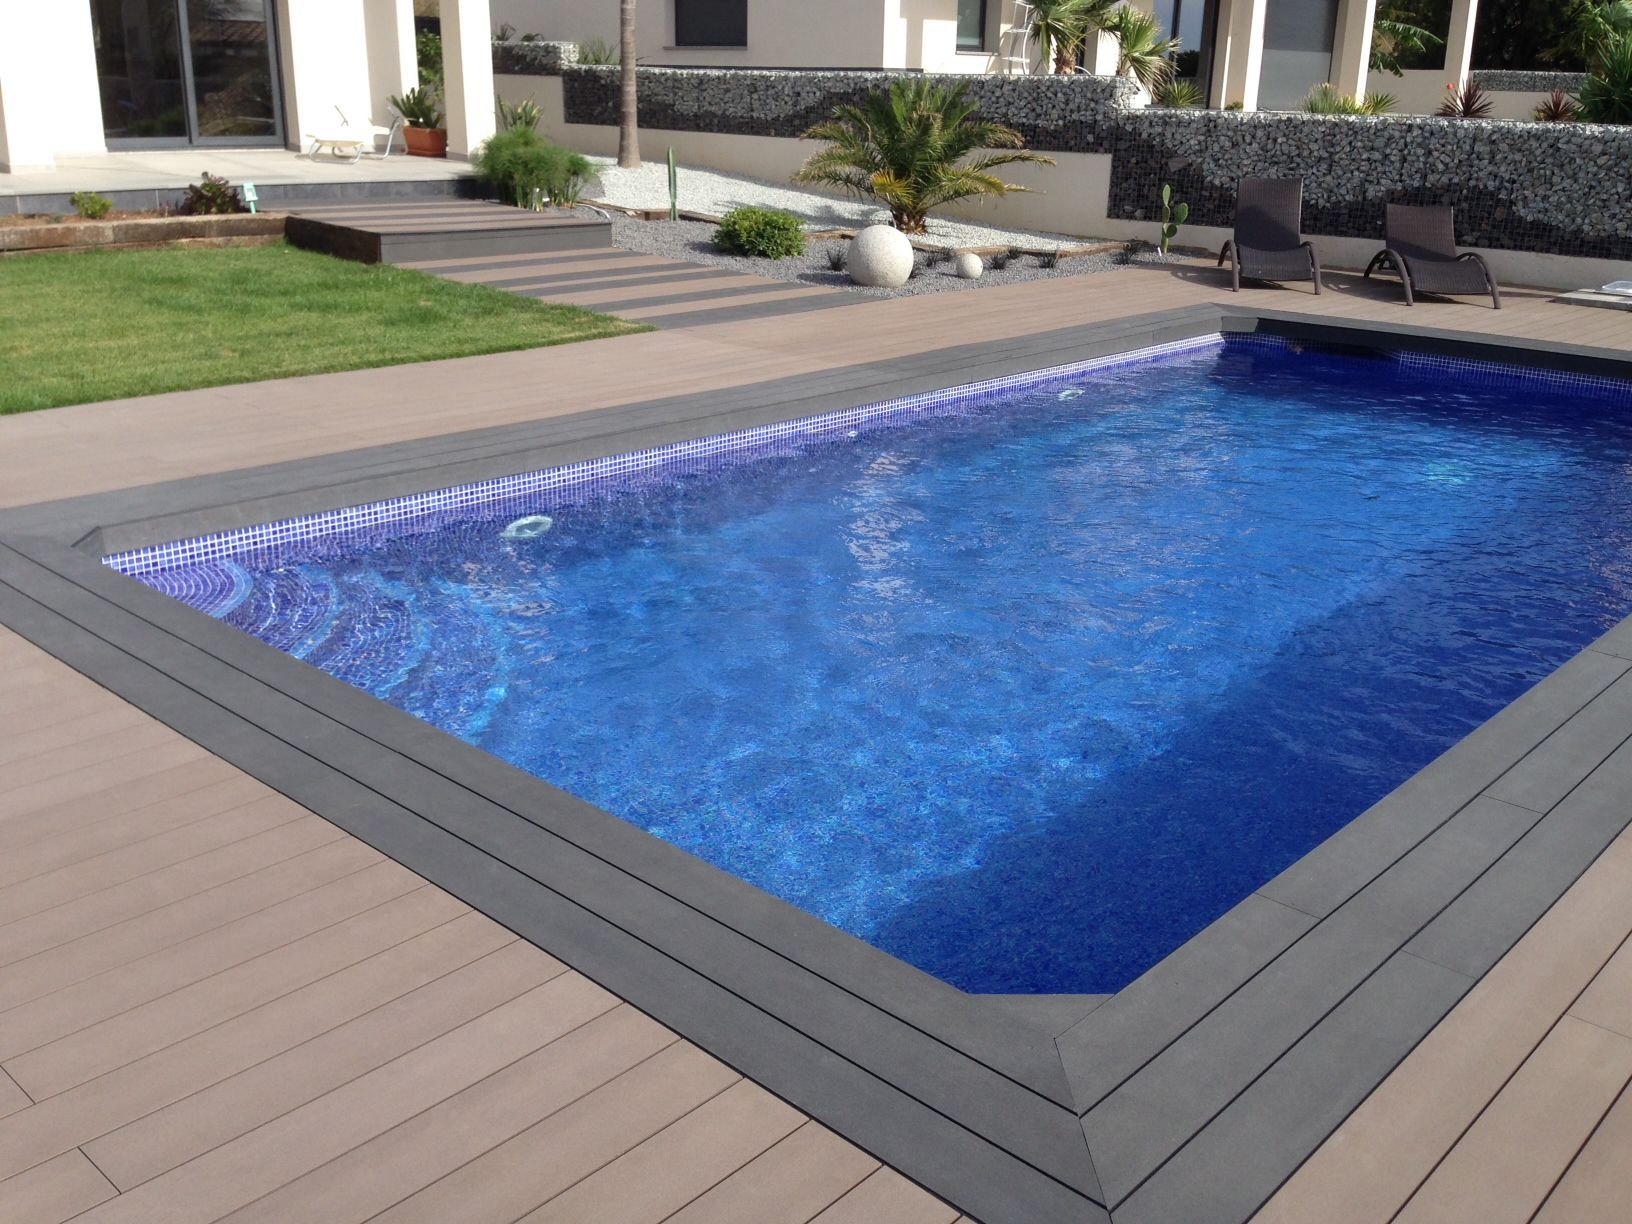 Tarima exterior composite alrededor de piscina se han - Tarima exterior sintetica ...